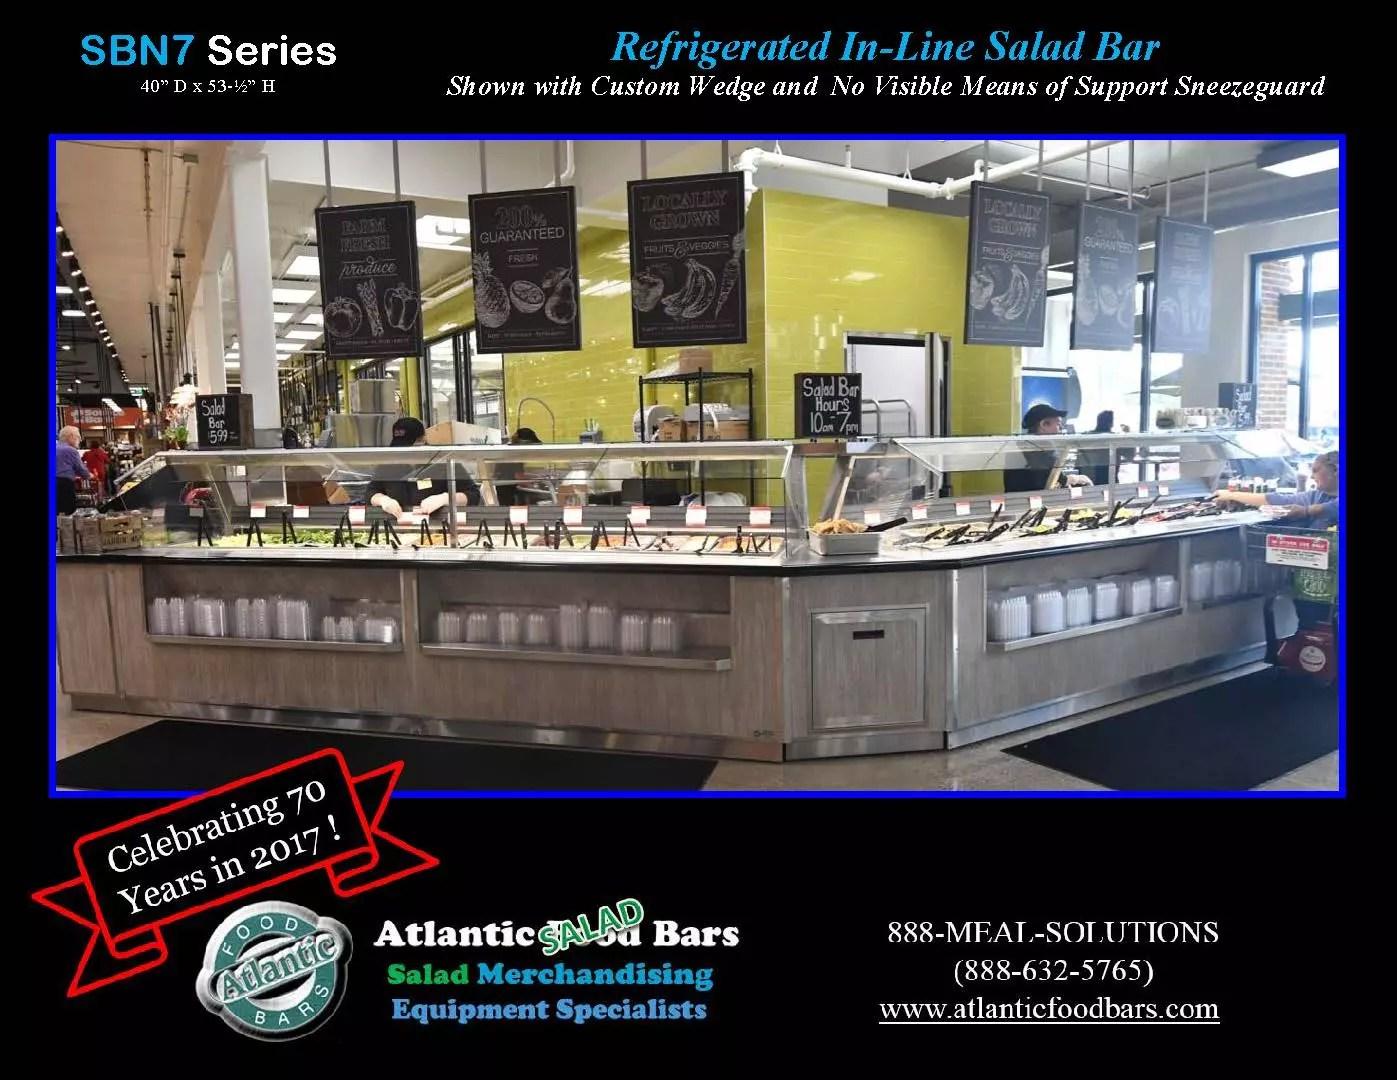 Atlantic Food Bars - Refrigerated In-Line Salad Bar 2 - SBN7